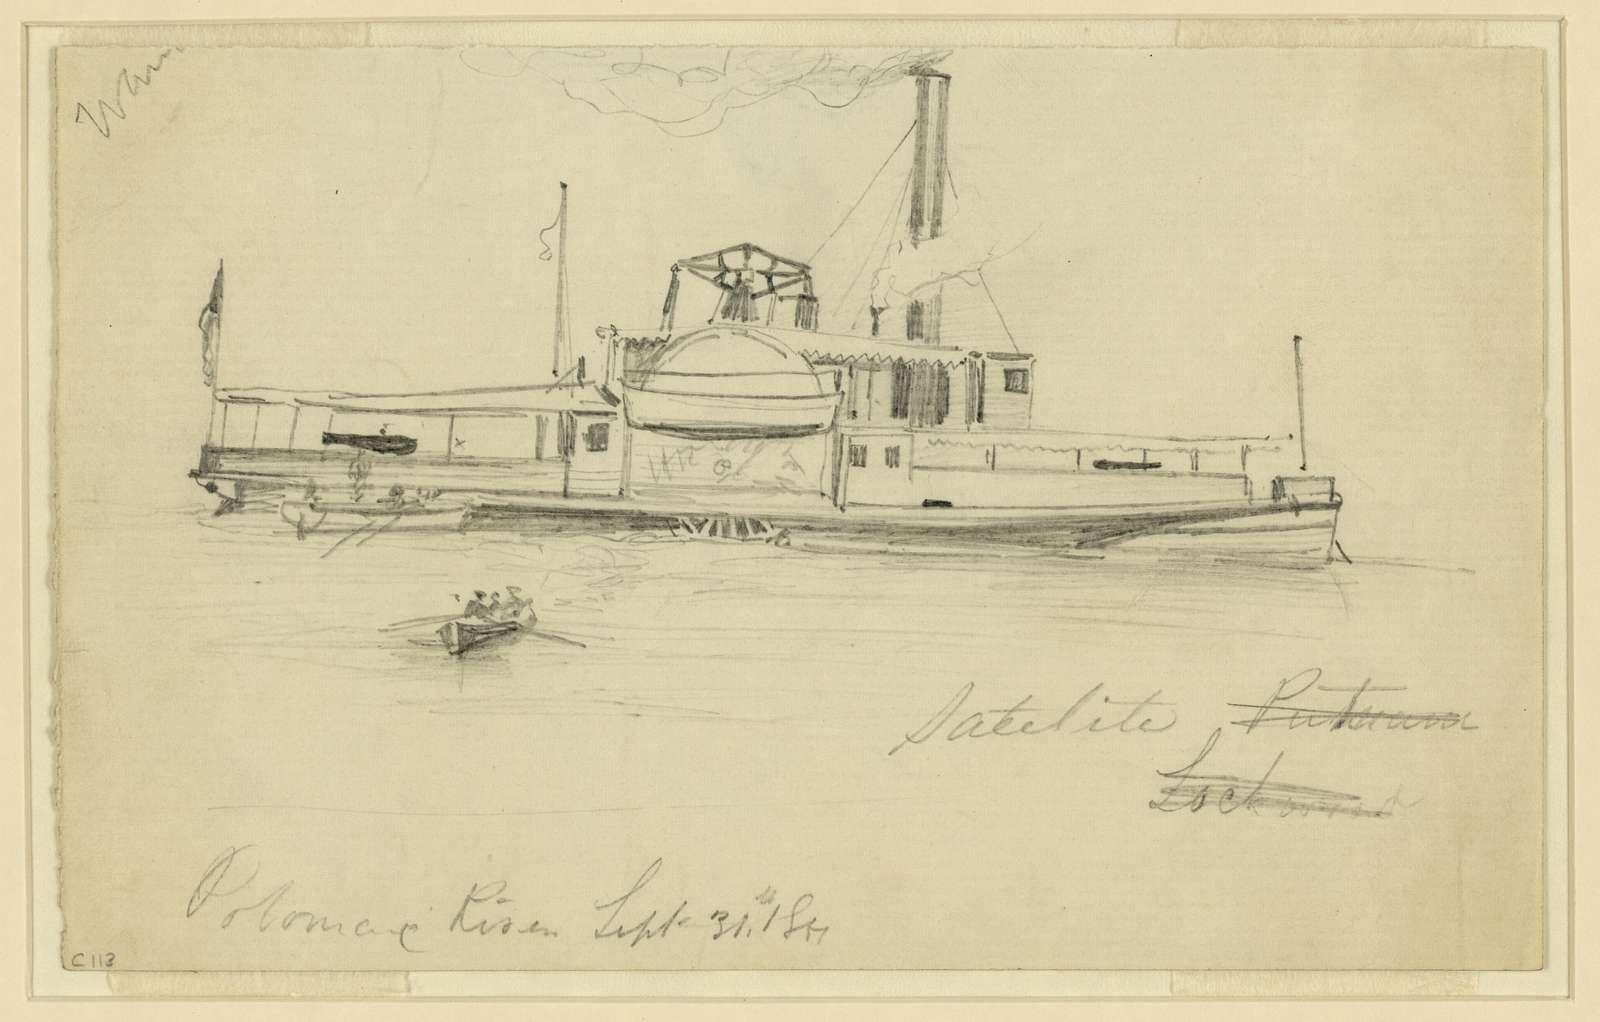 Potomac River, Sept. 31st, 1861